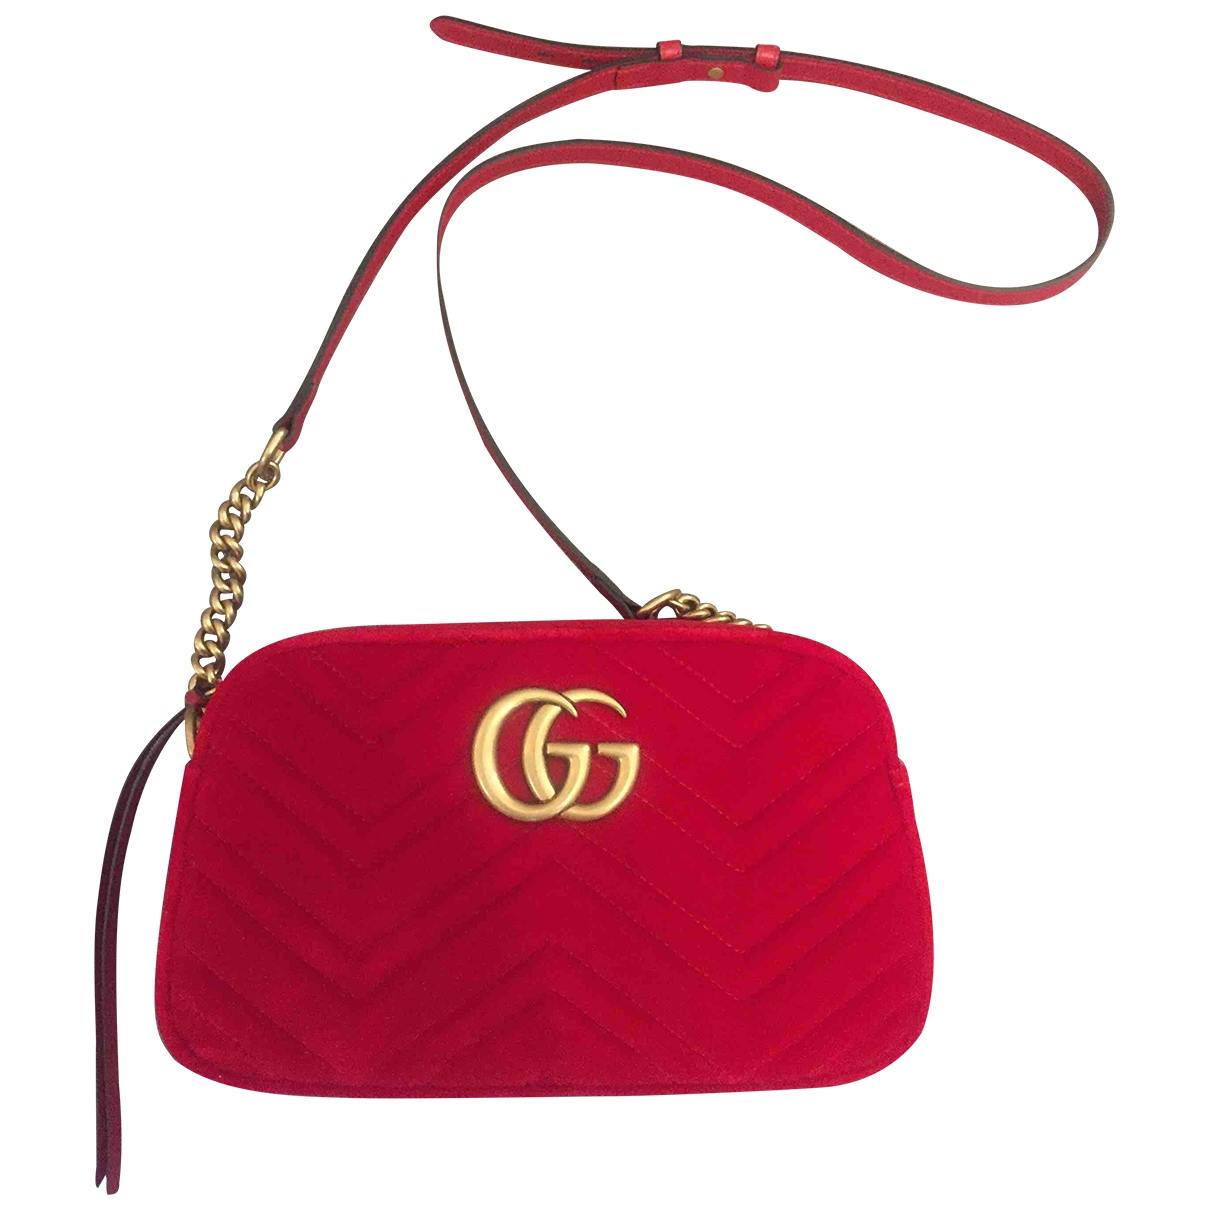 Gucci Marmont Handtasche in  Rot Samt